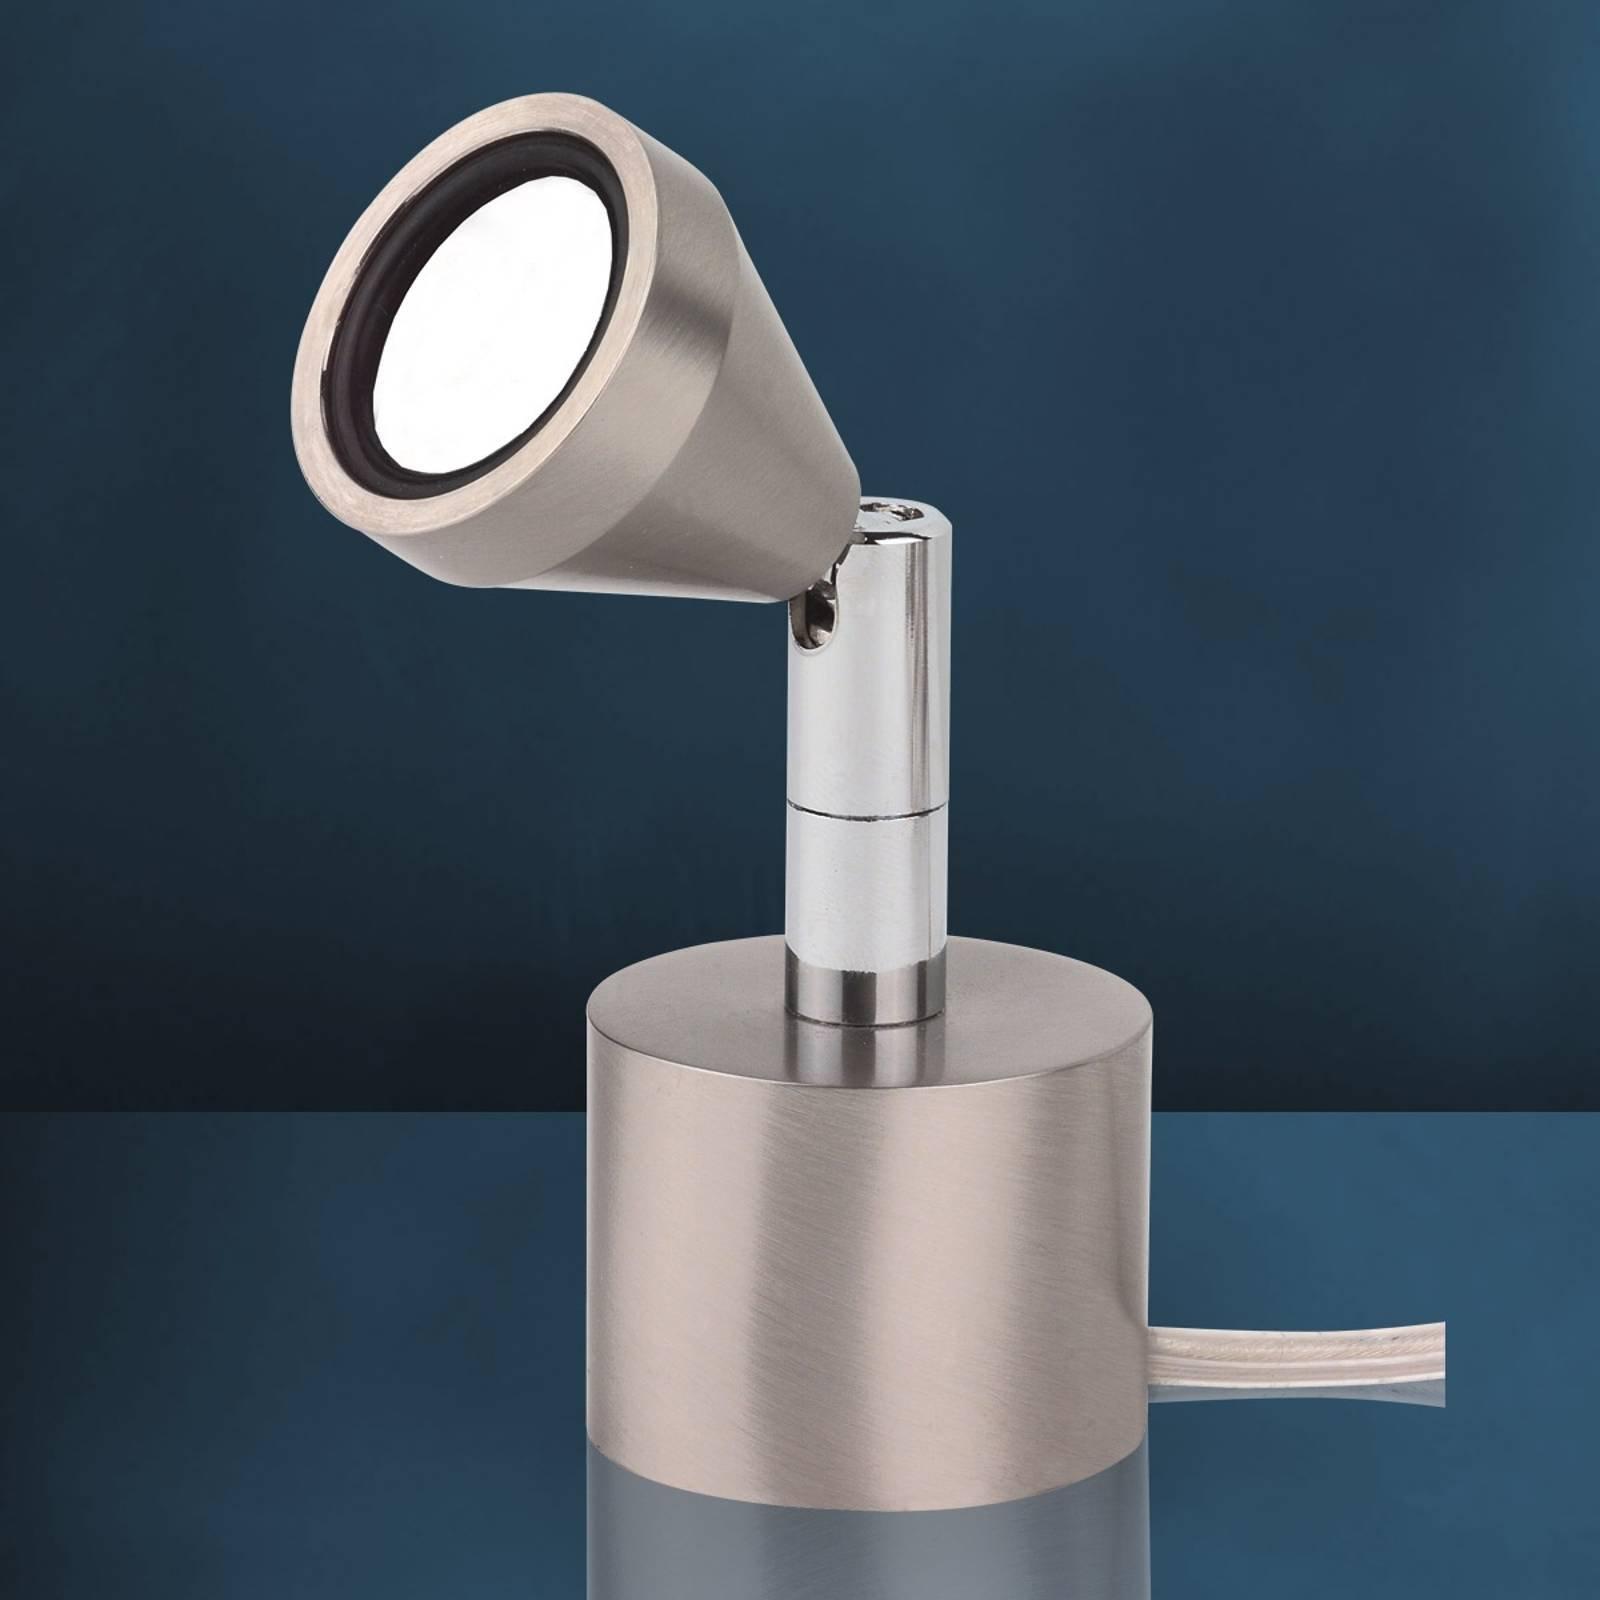 Flott MINI LED-bordlampe med universalhvitt lys